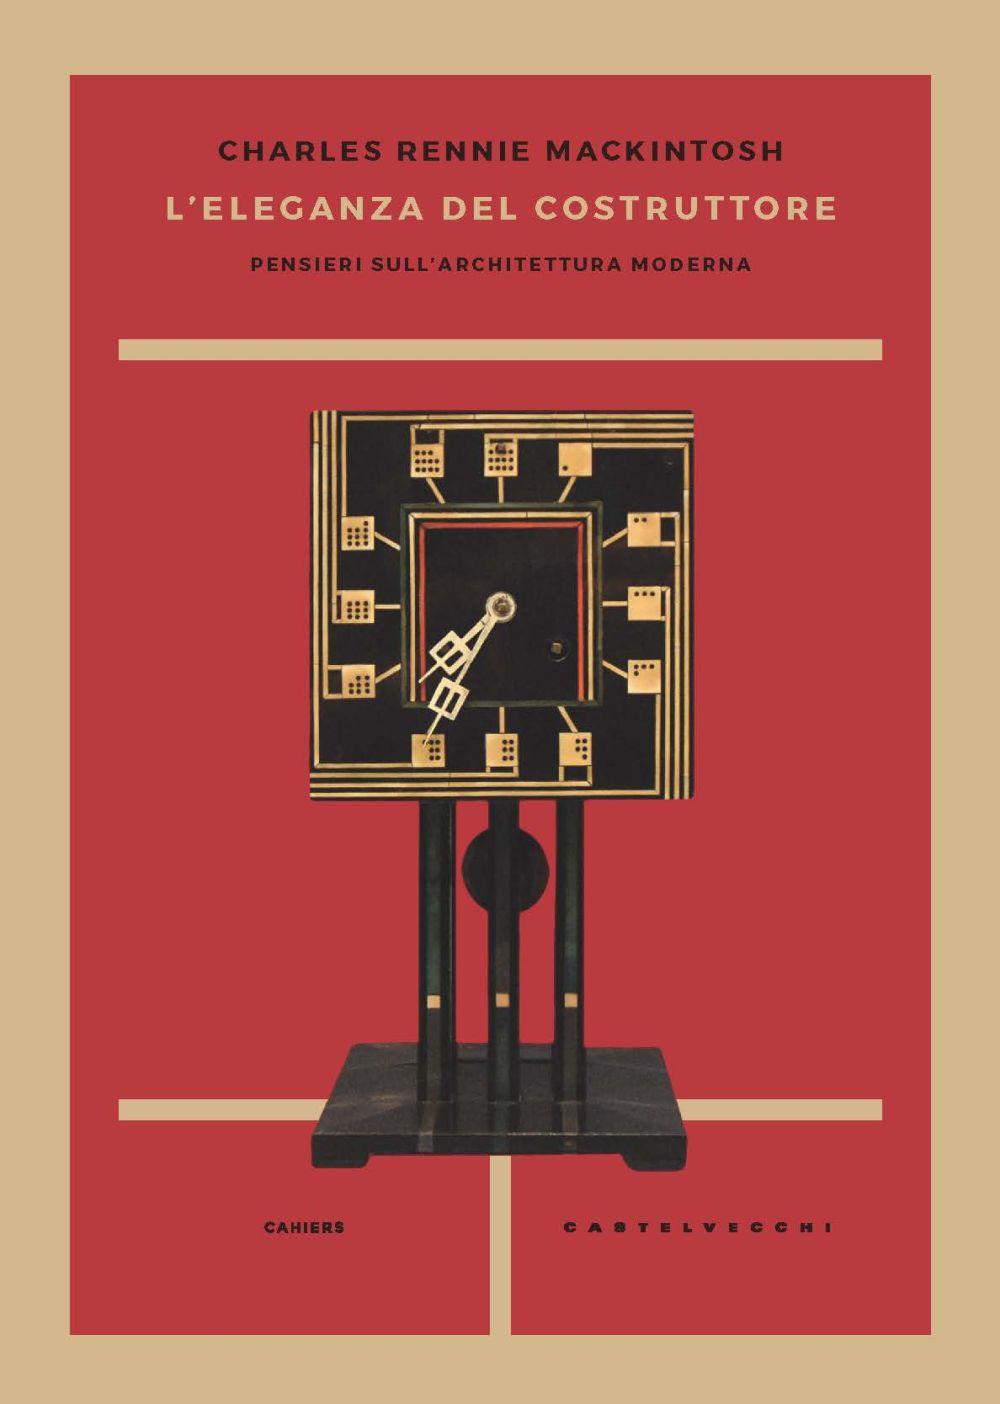 ELEGANZA DEL COSTRUTTORE. PENSIERI SULL'ARCHITETTURA MODERNA (L') - MacKintosh Charles Rennie; Martore P. (cur.) - 9788832900309